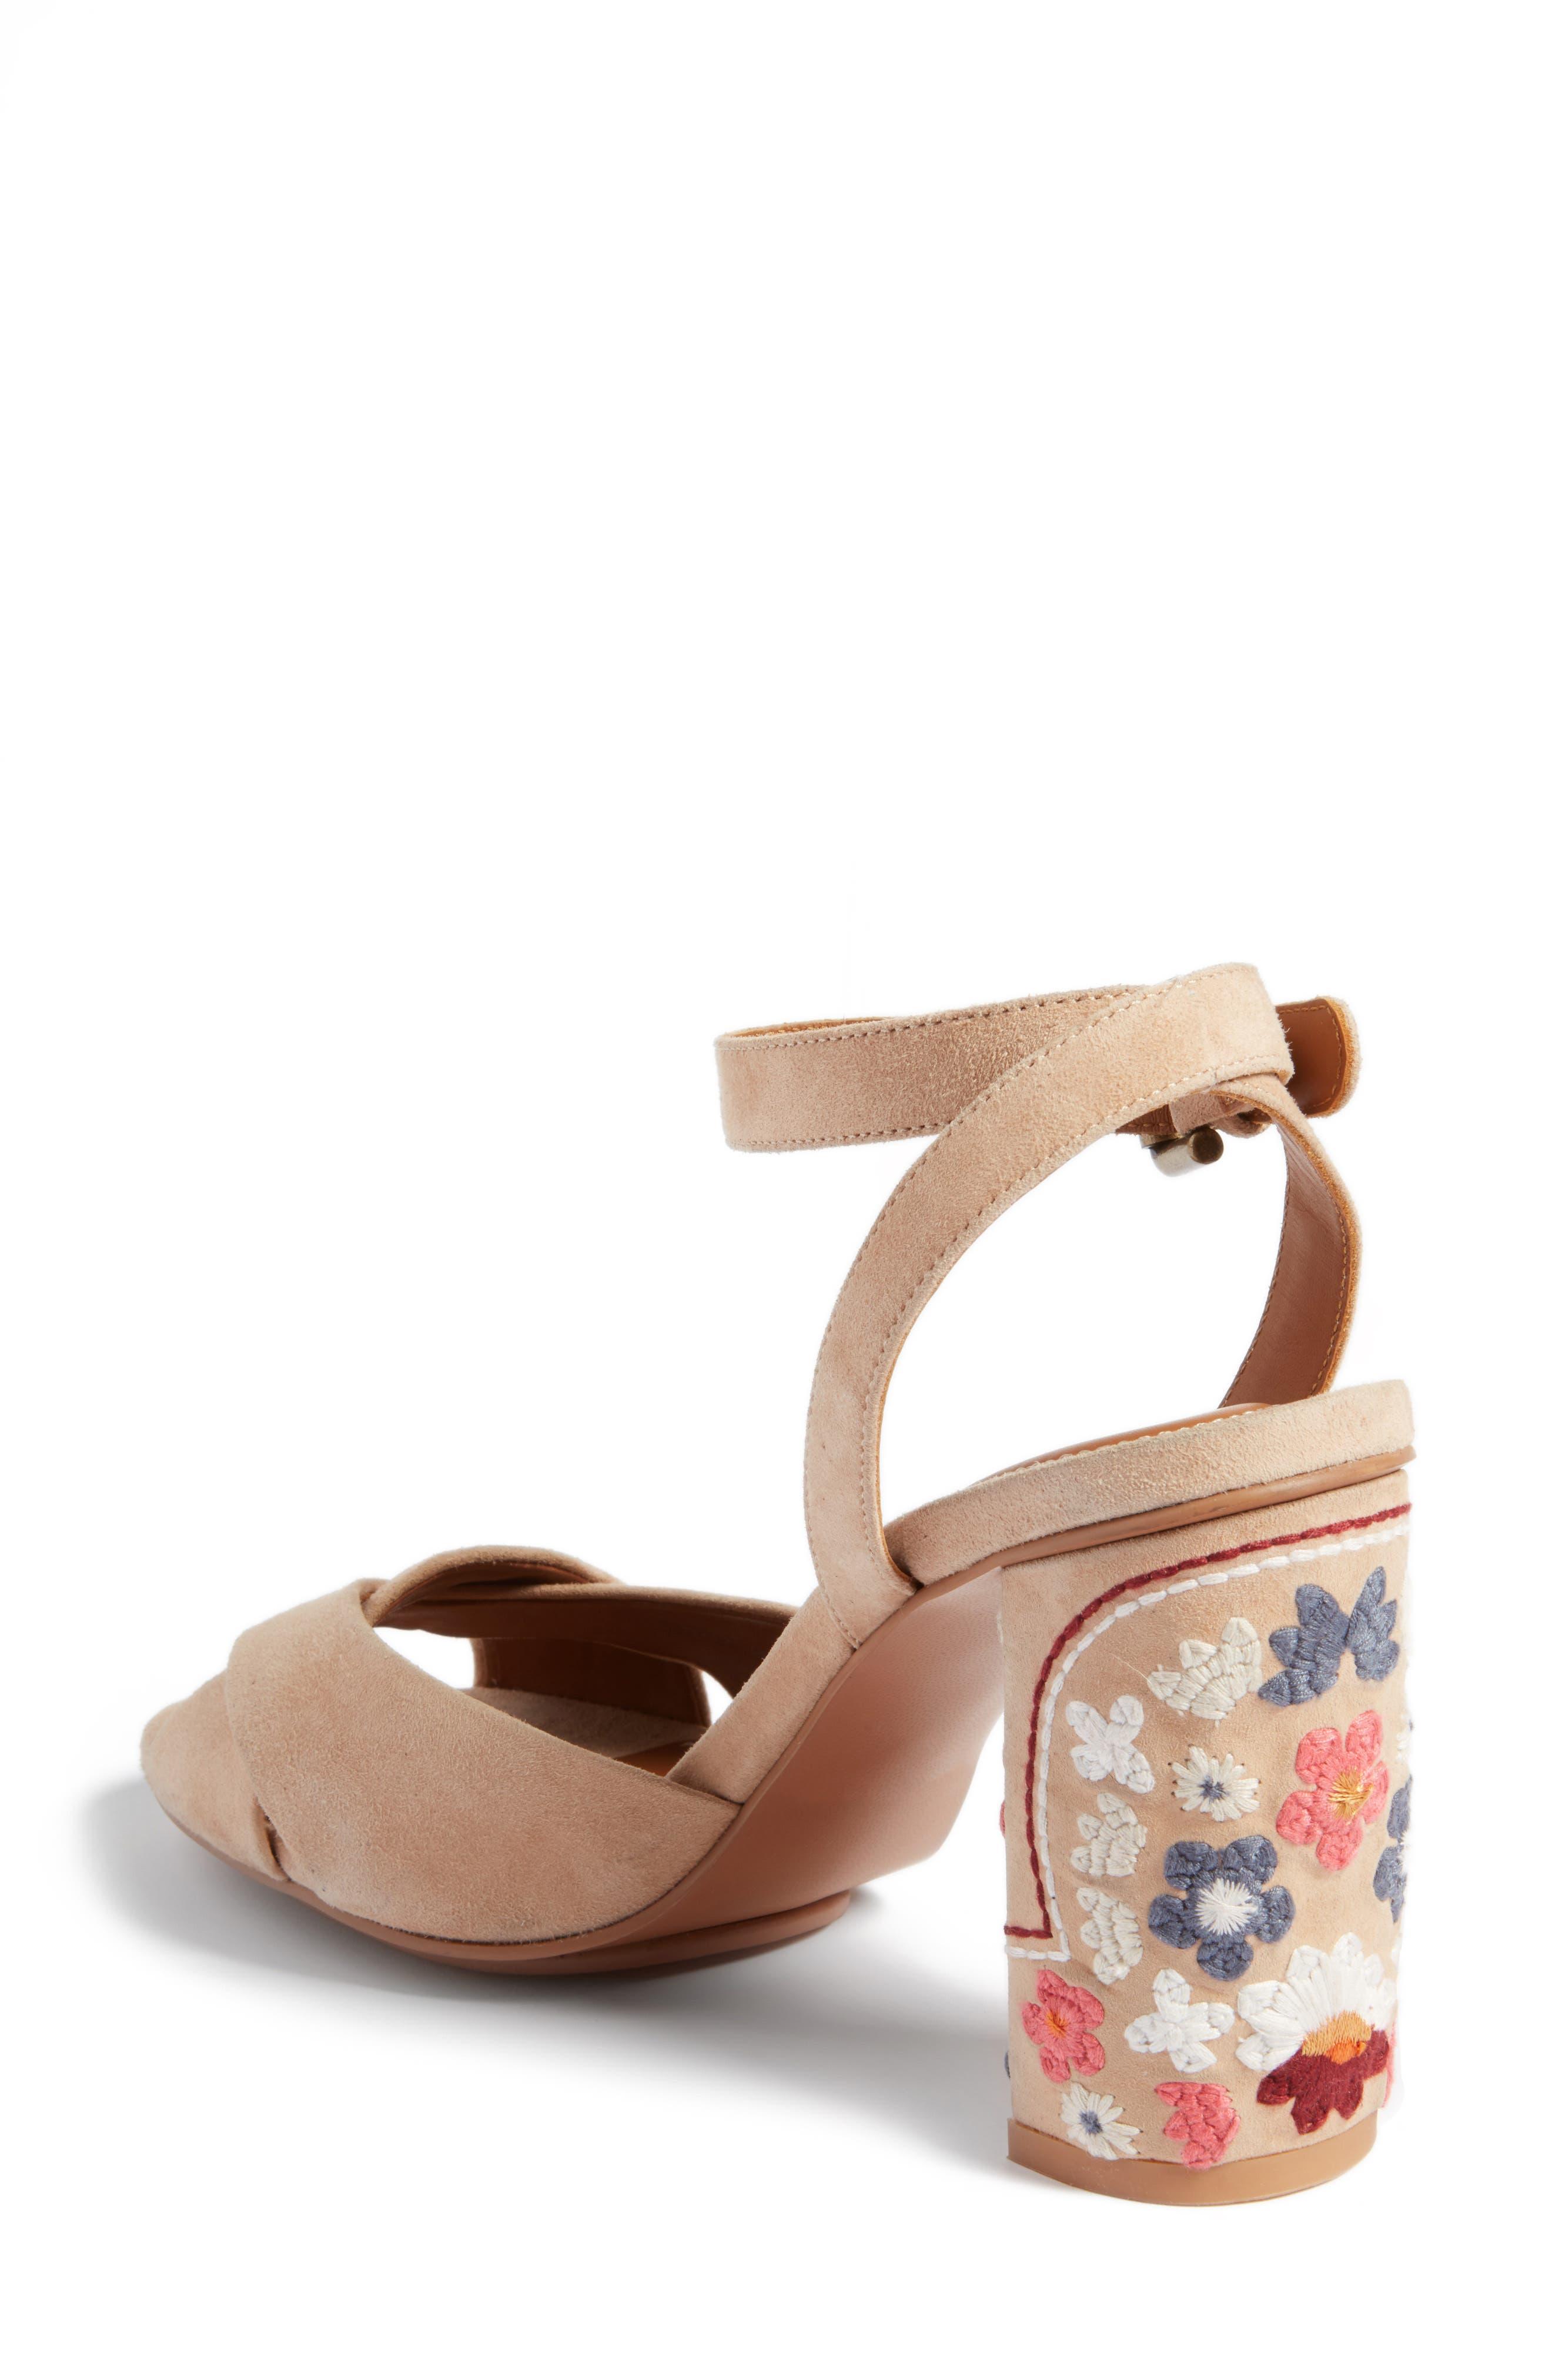 Gayla Embroidered Block Heel Sandal,                             Alternate thumbnail 2, color,                             250